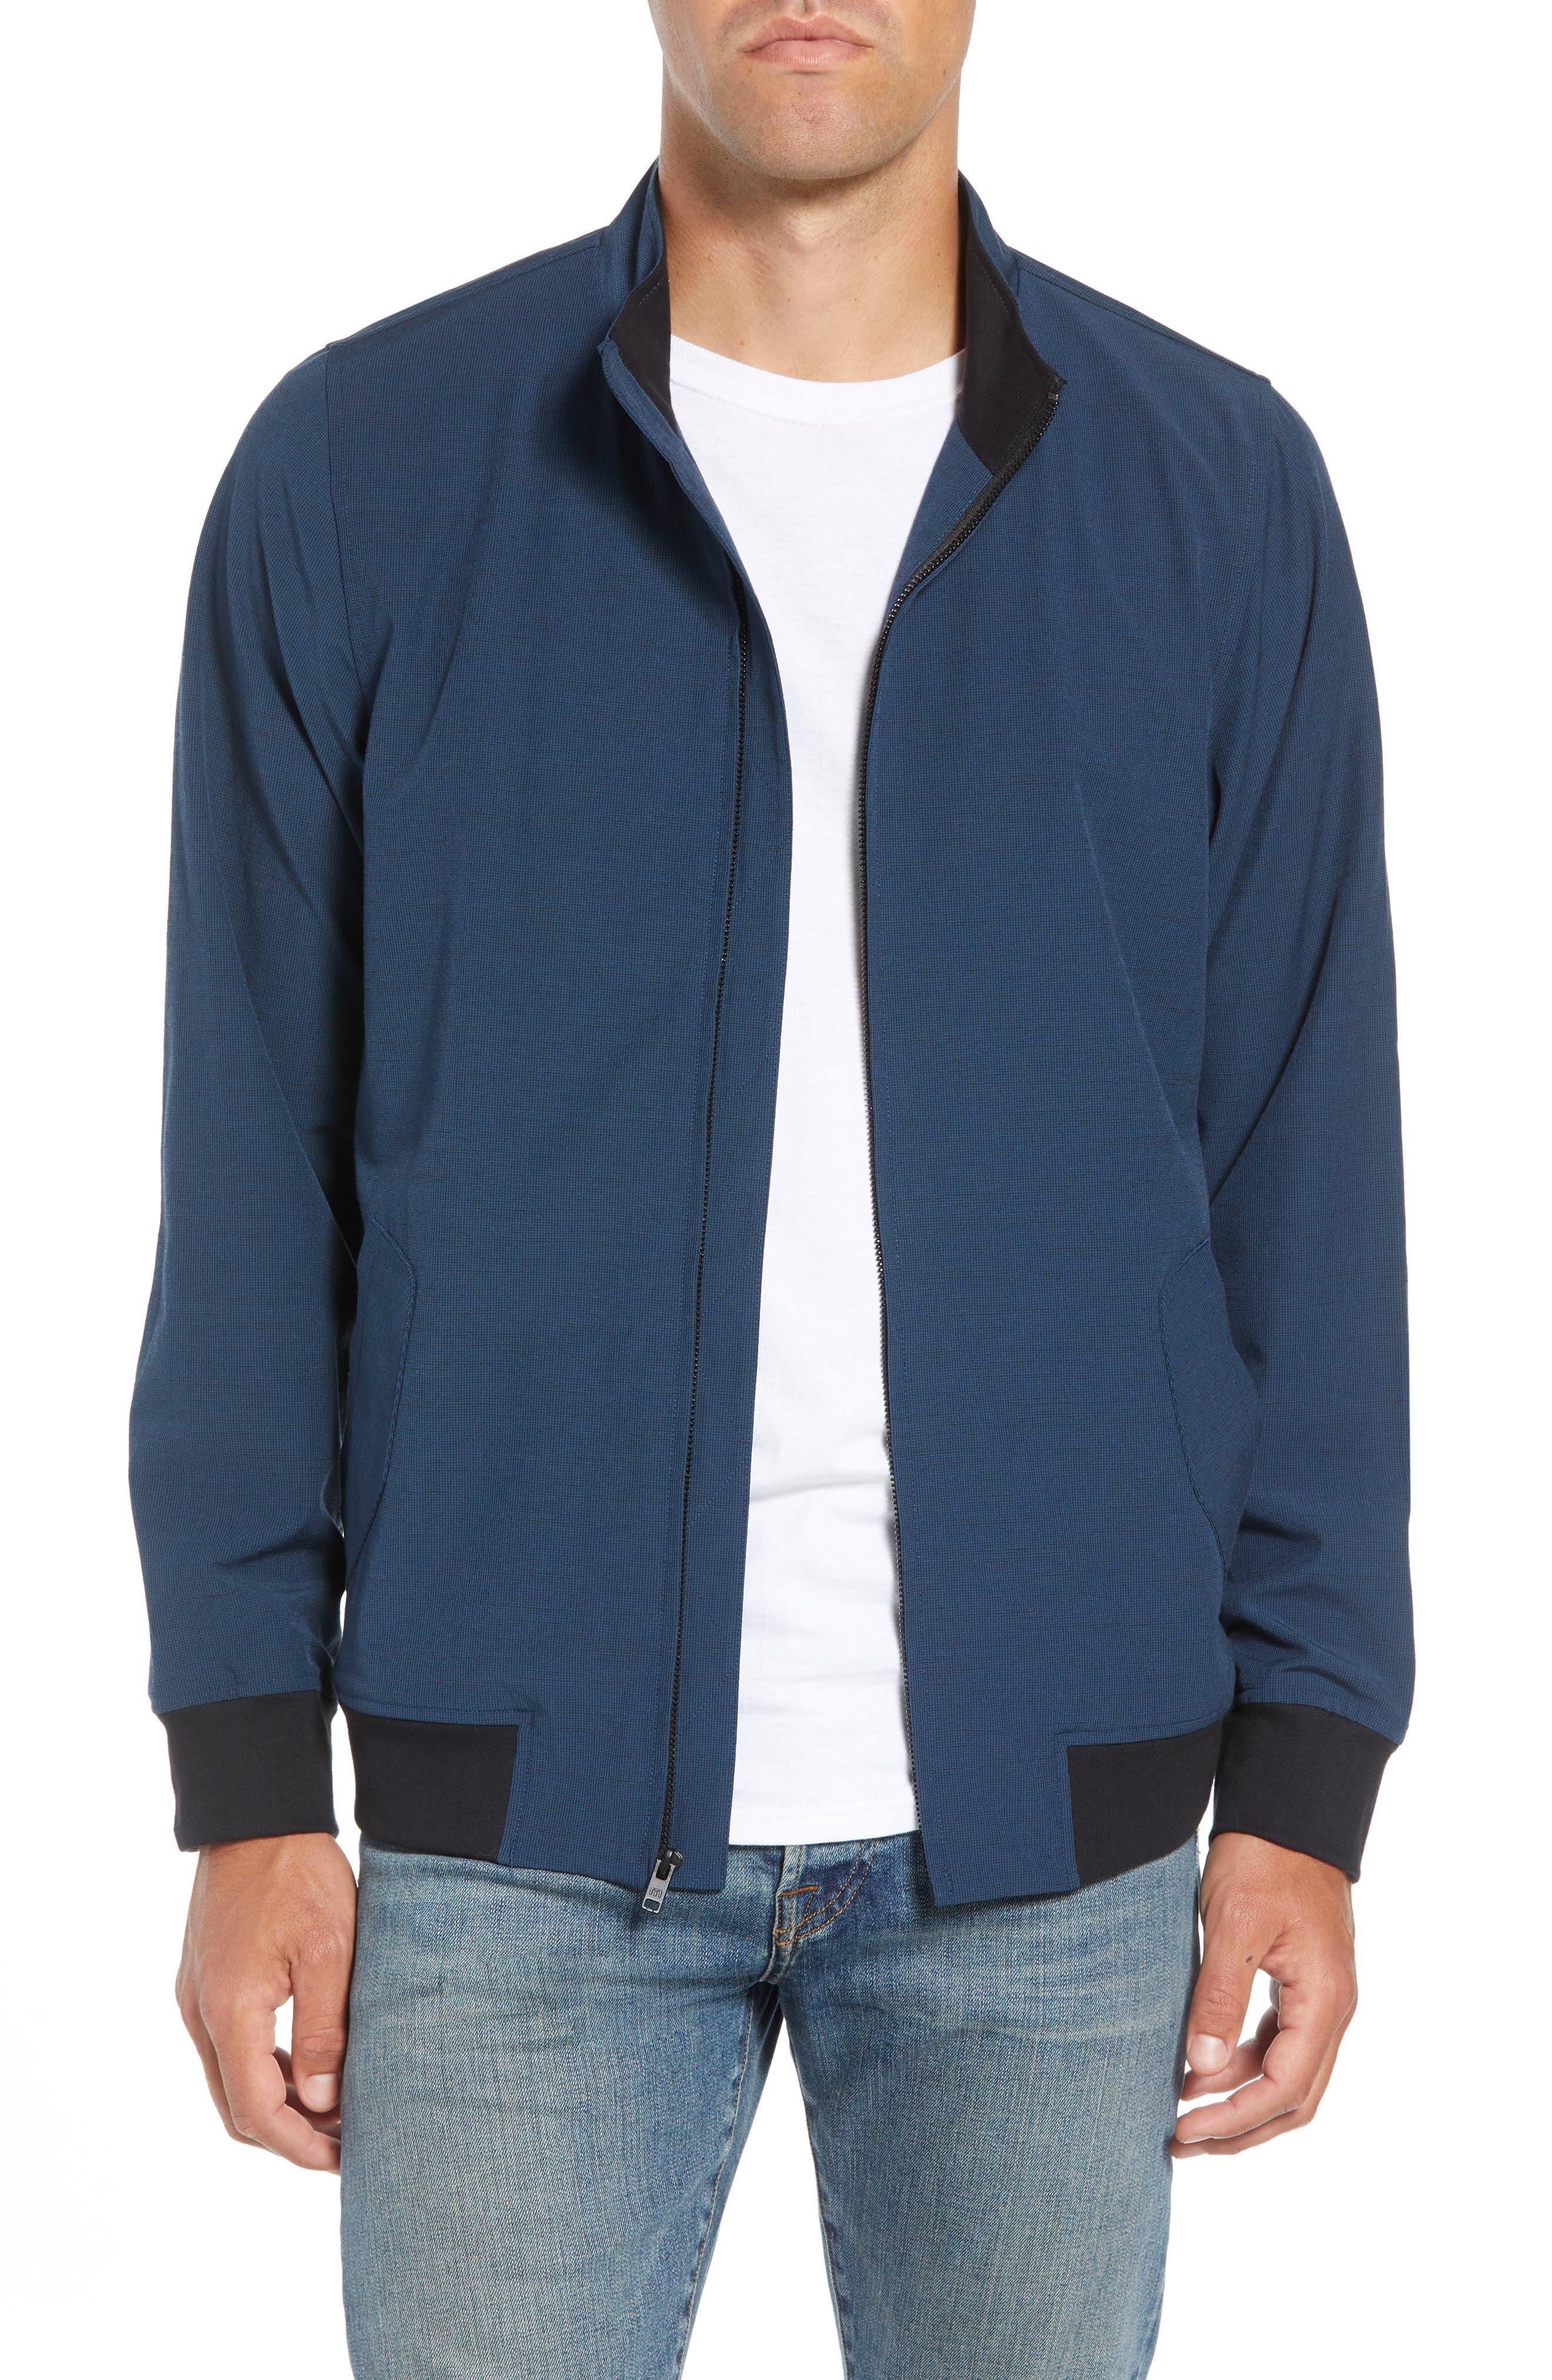 Ridgley Regular Fit Jacket,                         Main,                         color, BLUE WING TEAL/ BLACK